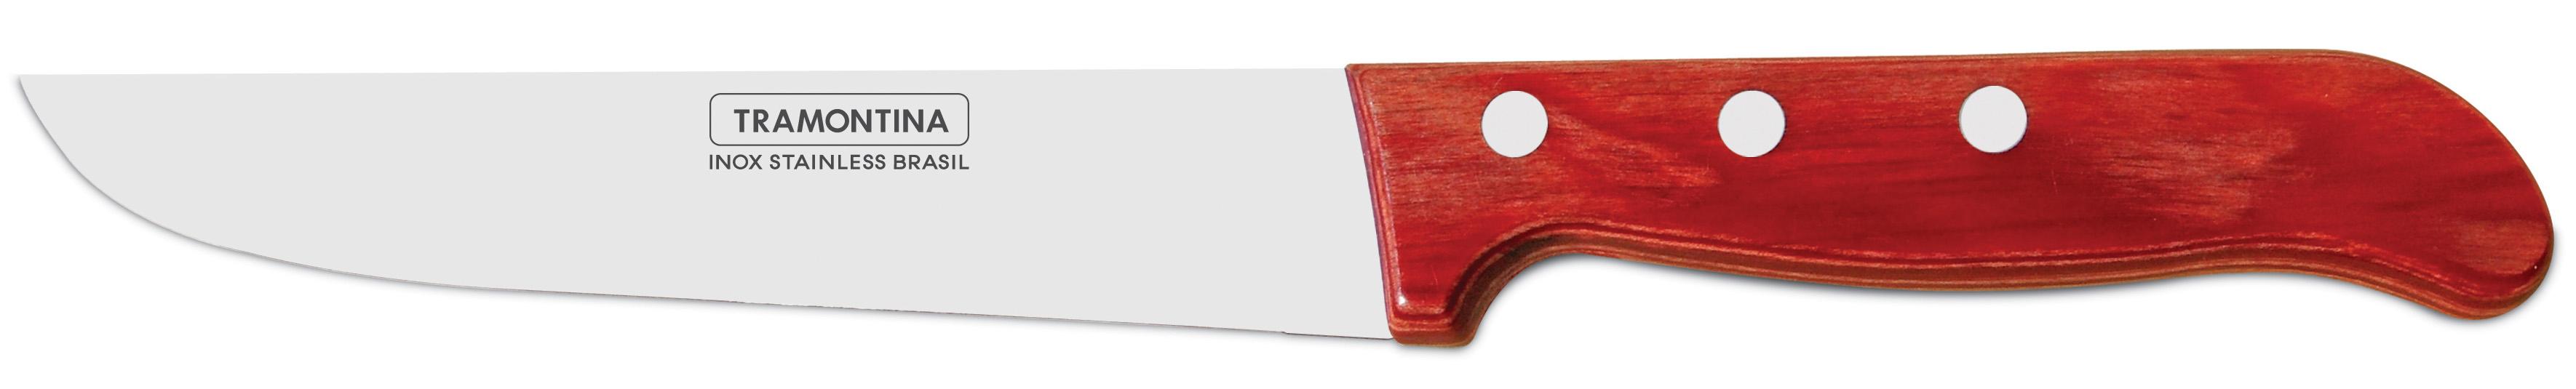 "Tramontina Polywood Нож кухонный 7"" 21127/077"